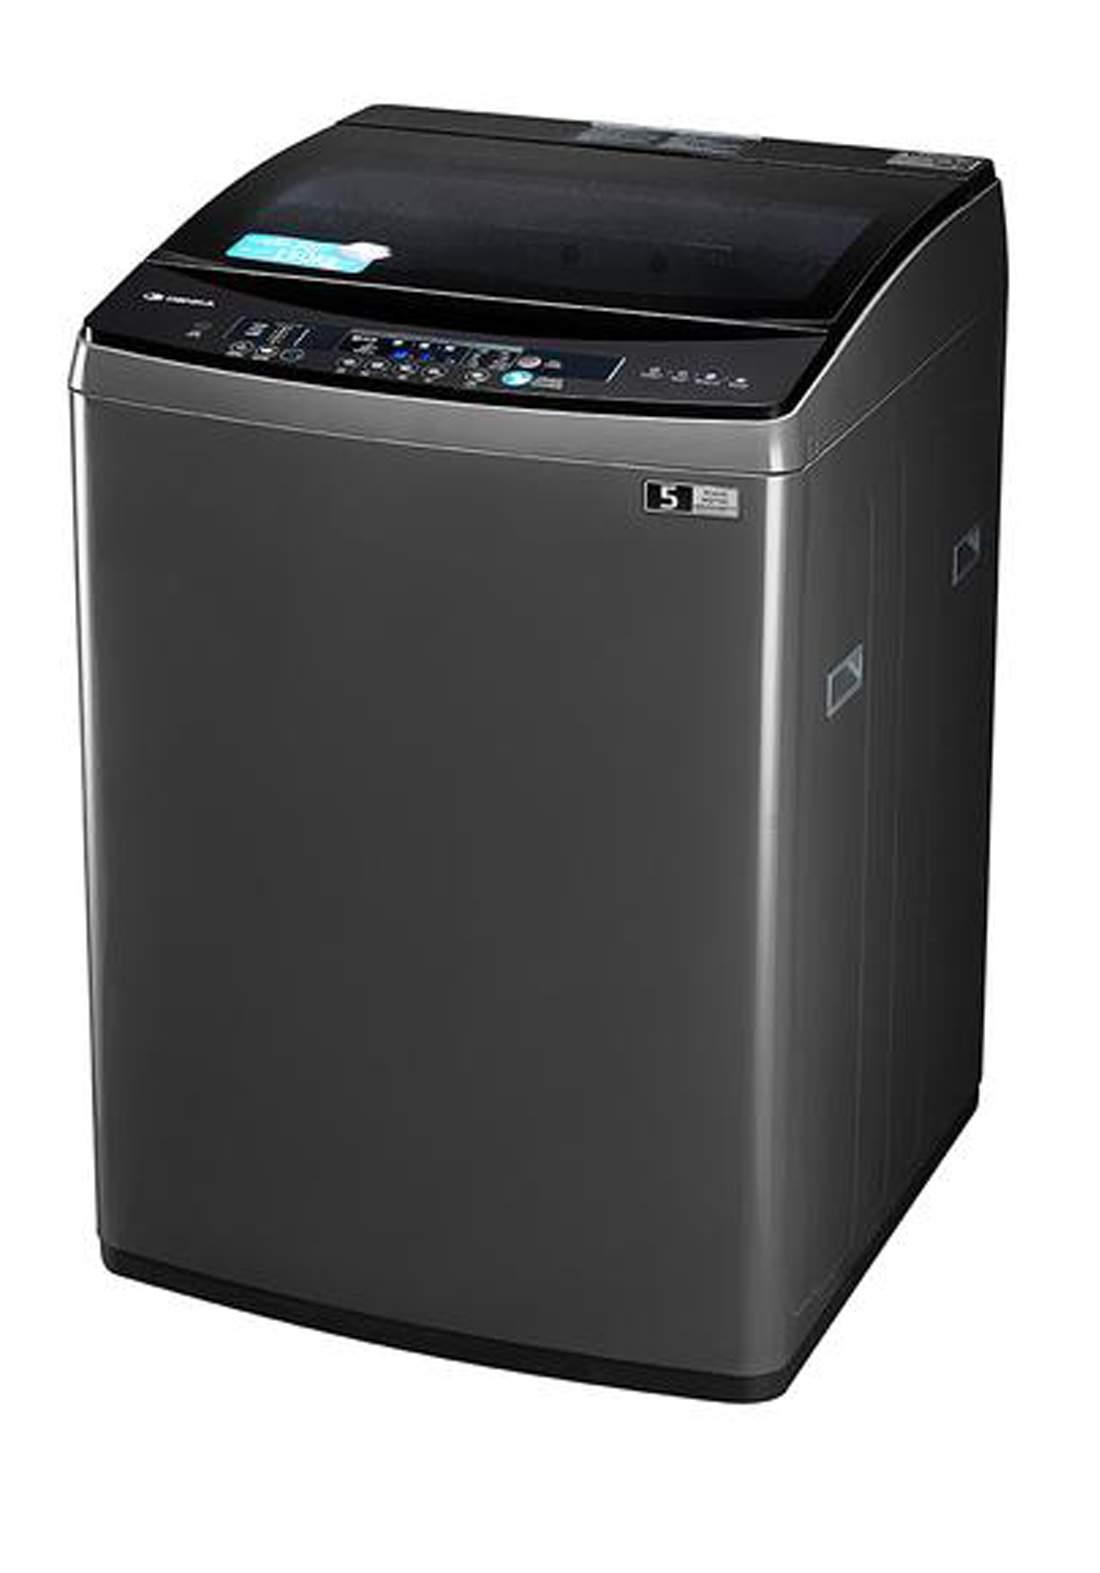 DENKA QWM-1950TLSL washing machine 19.5kg  غسالة ملابس